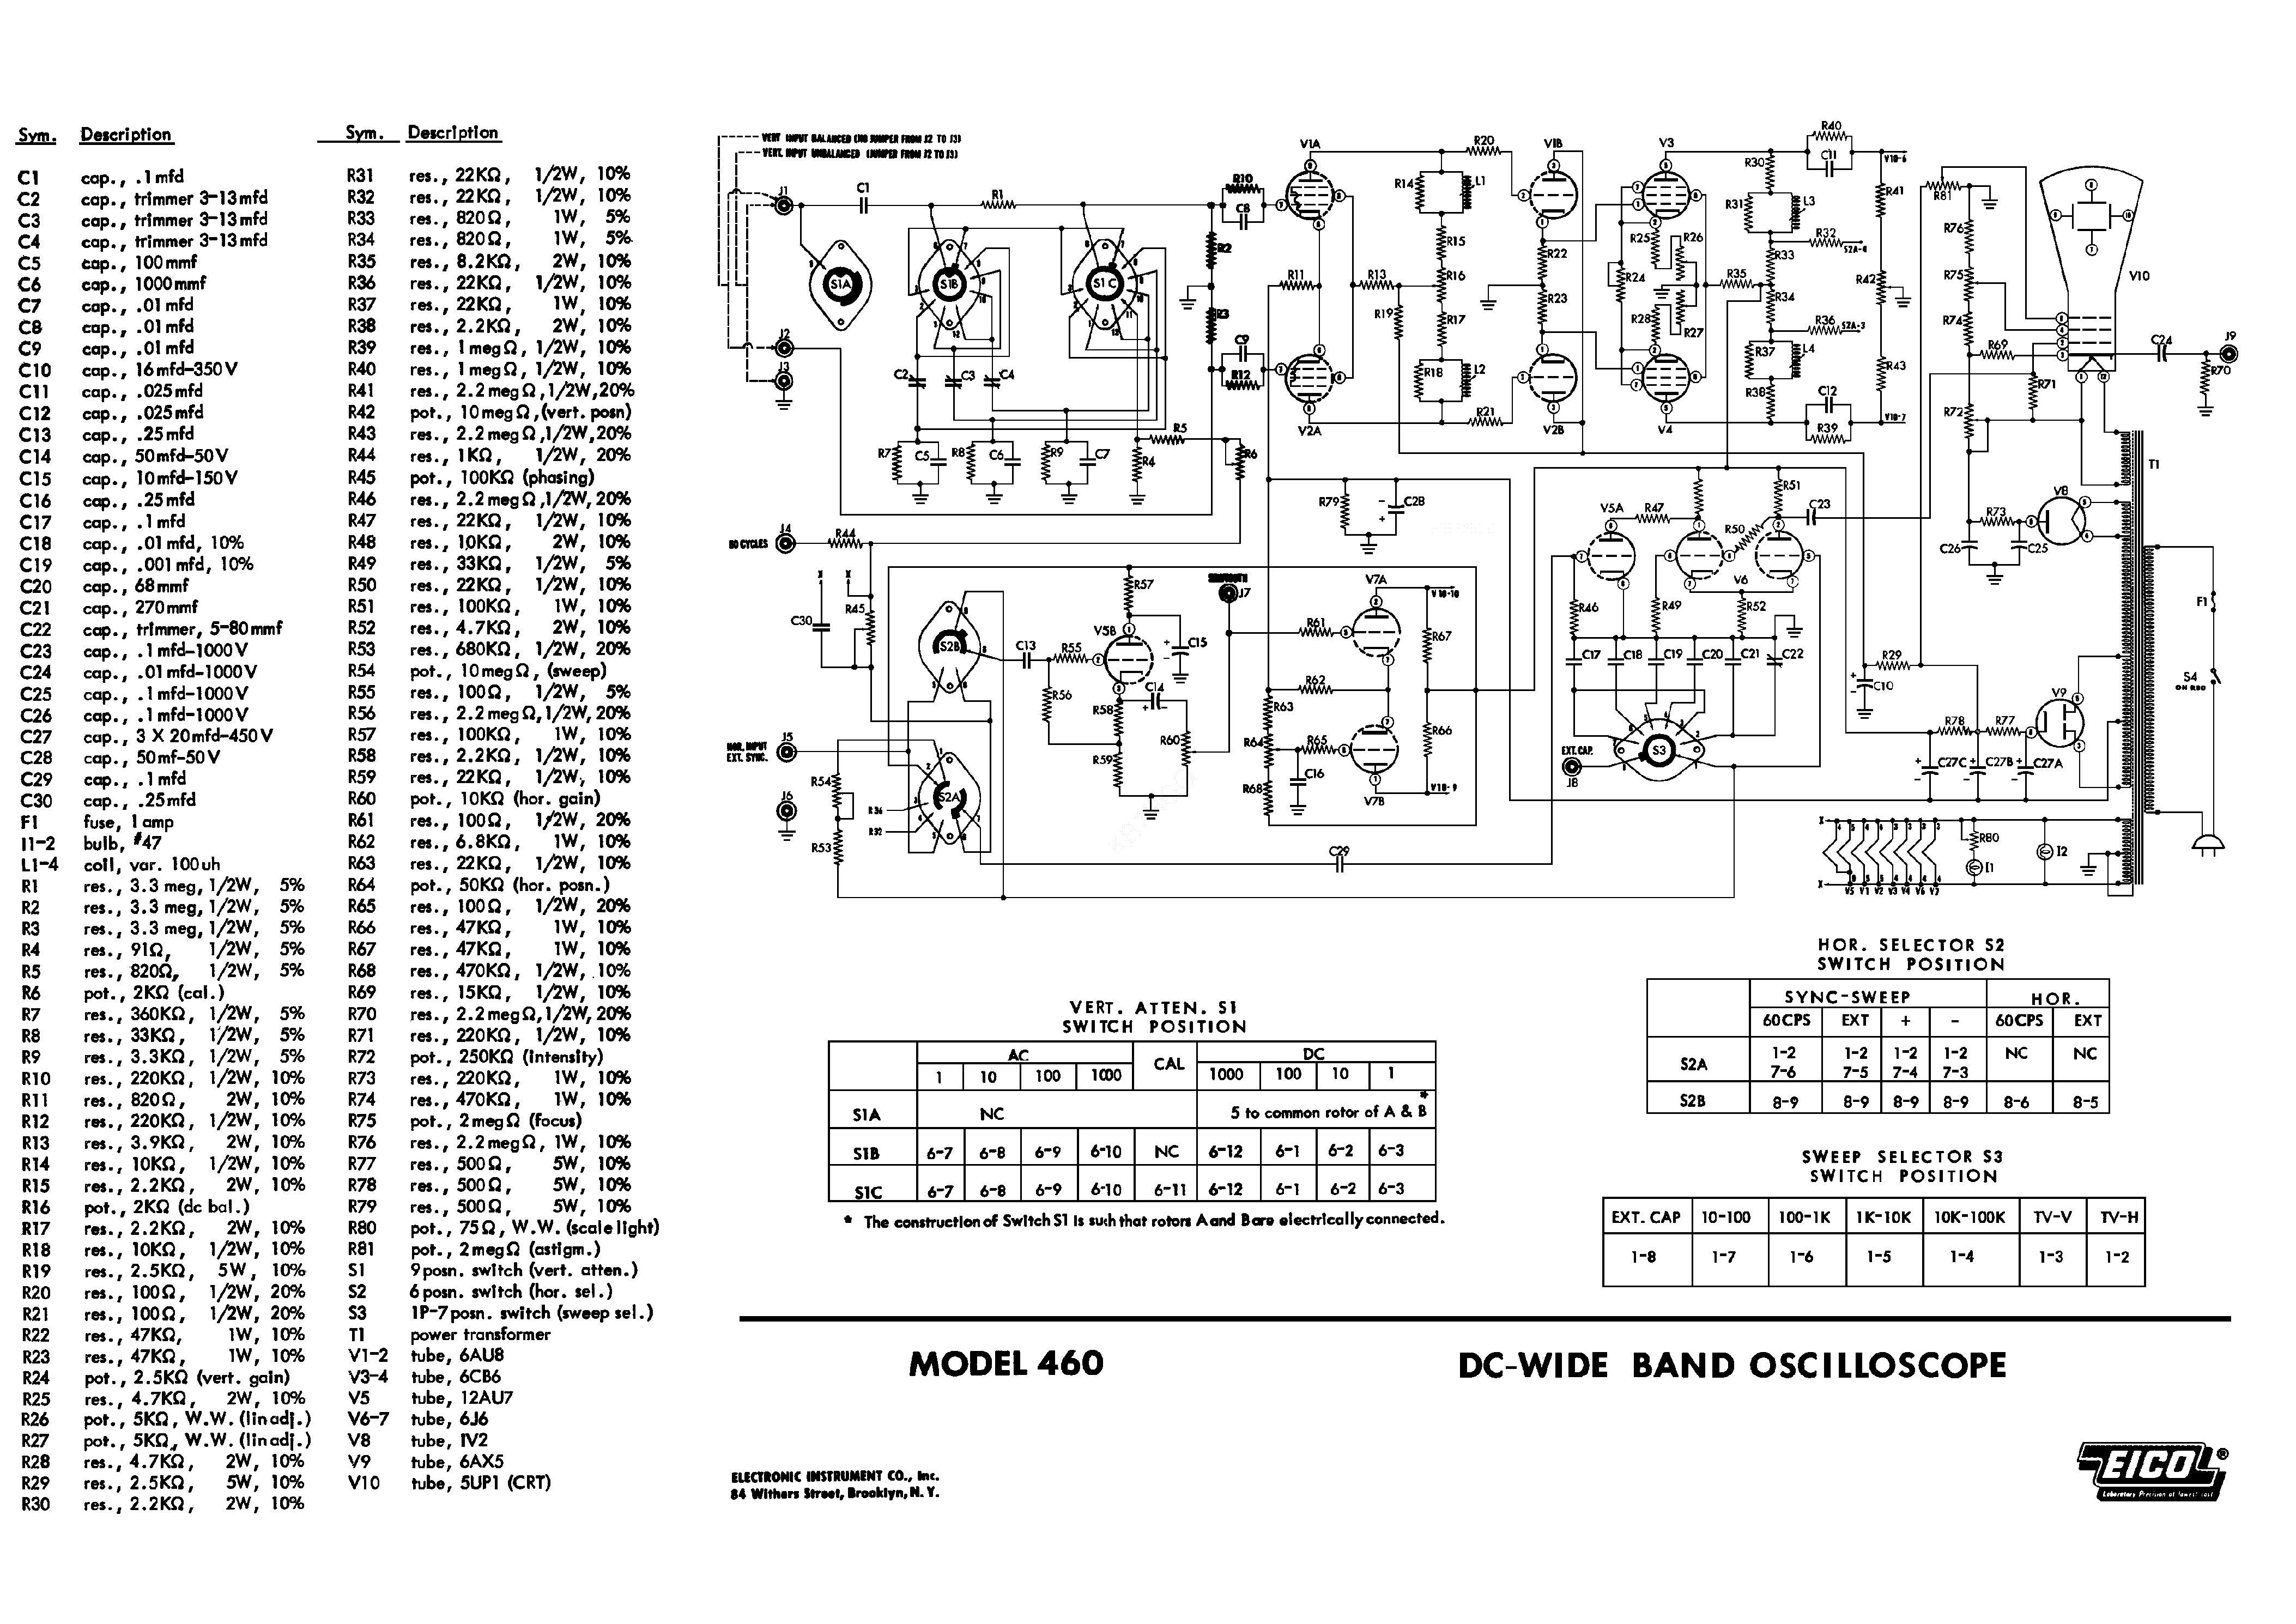 eico 460 parts sch service manual download schematics eeprom rh elektrotanya com DIY PC Oscilloscope Simple Schematic Diagrams Circuits